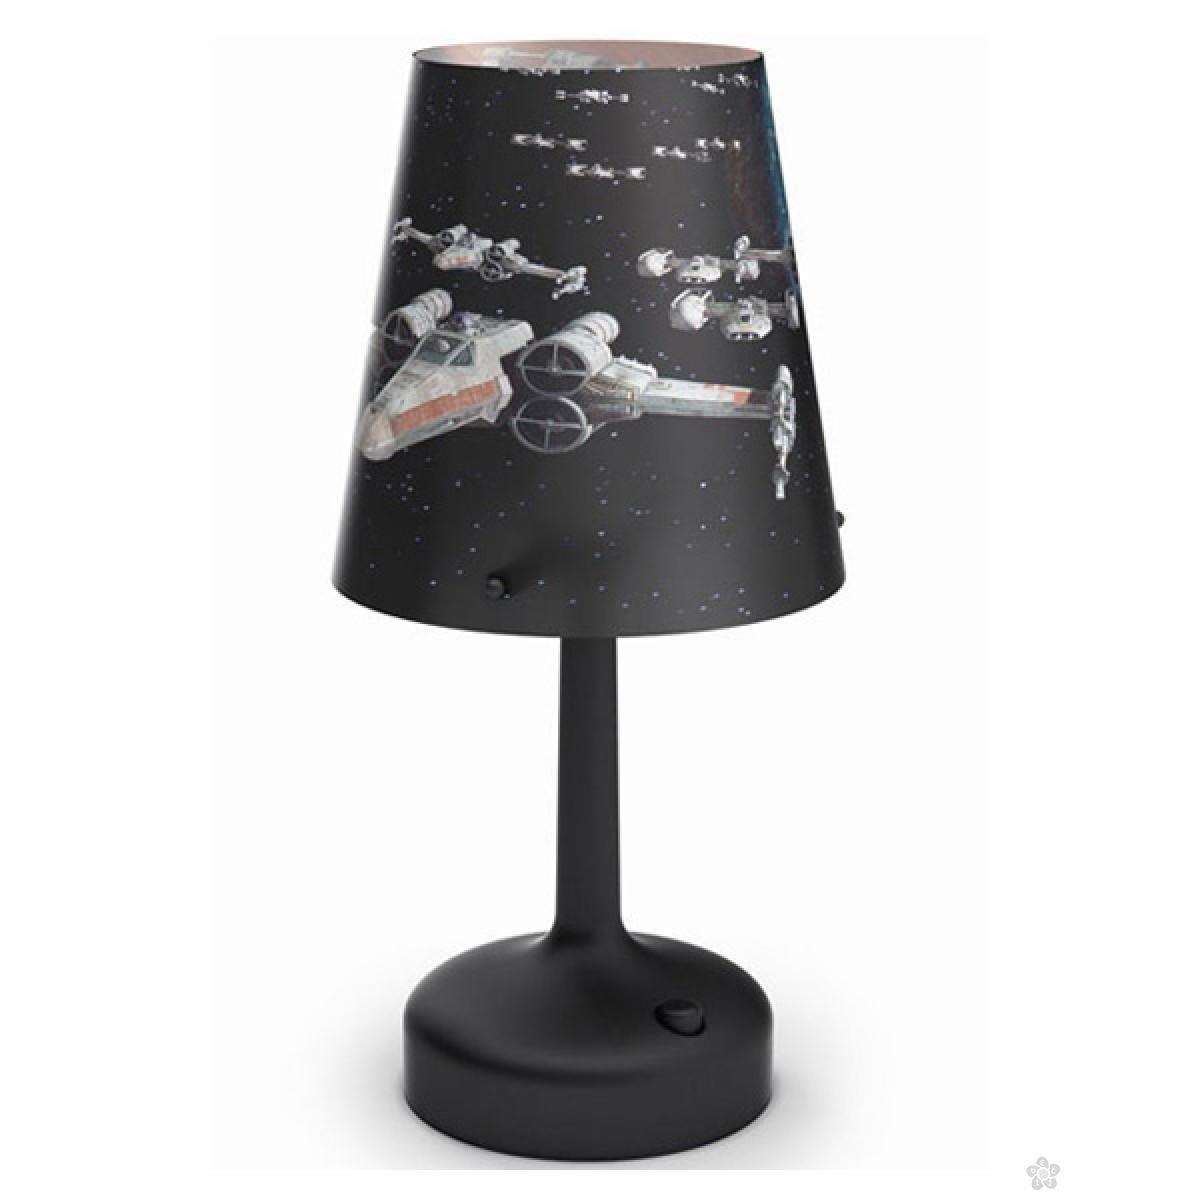 Stona lampa Philips Spaceships-crna Star Wars 71888/30/16